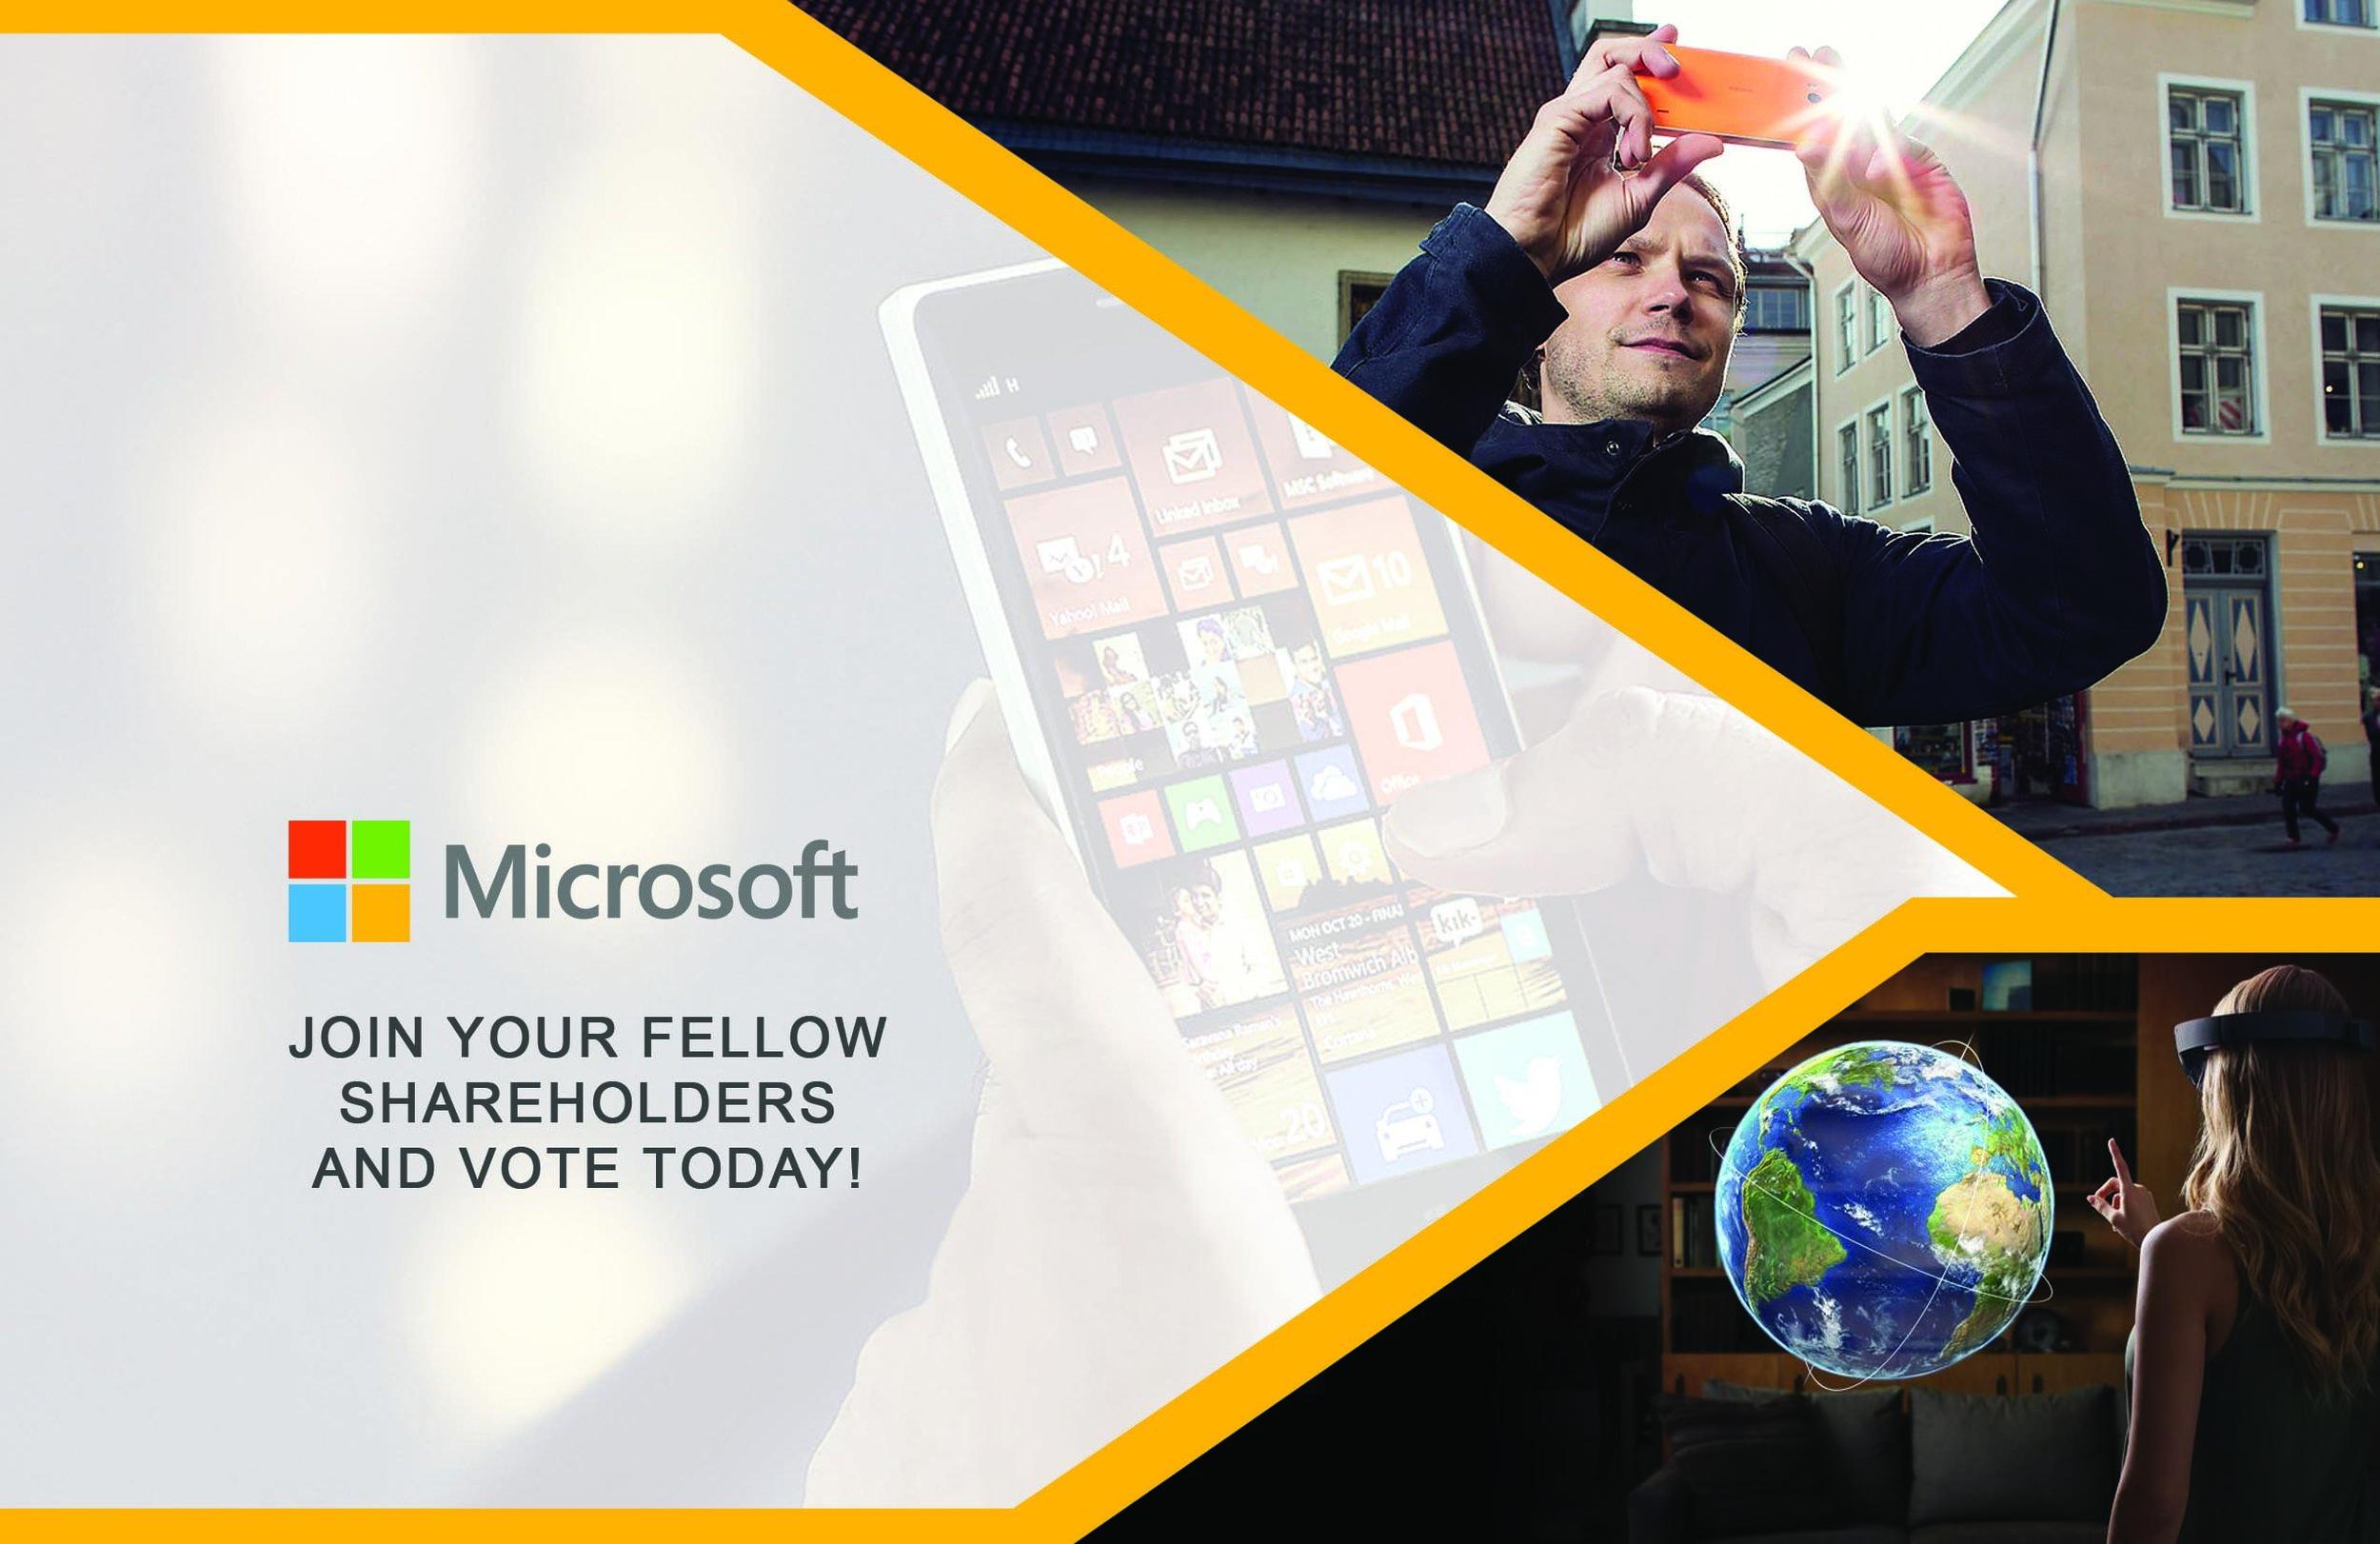 Microsoft_Notice_LOW RES.jpg